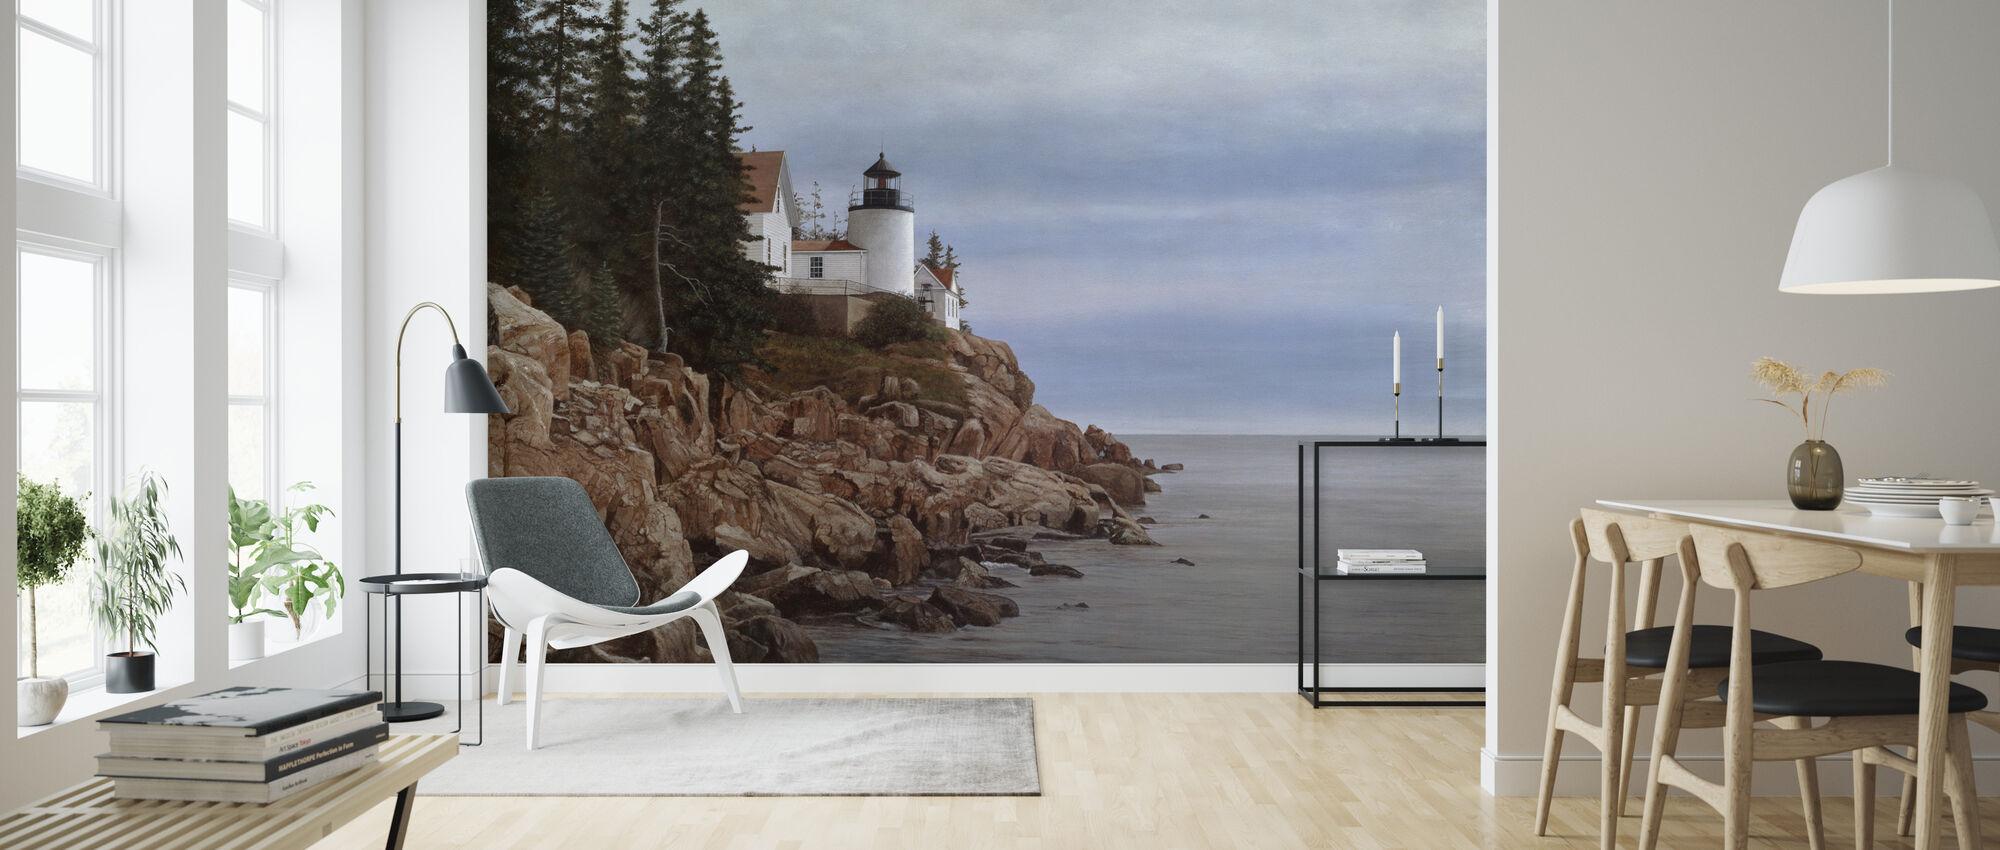 Bass Harbor Light - Wallpaper - Living Room